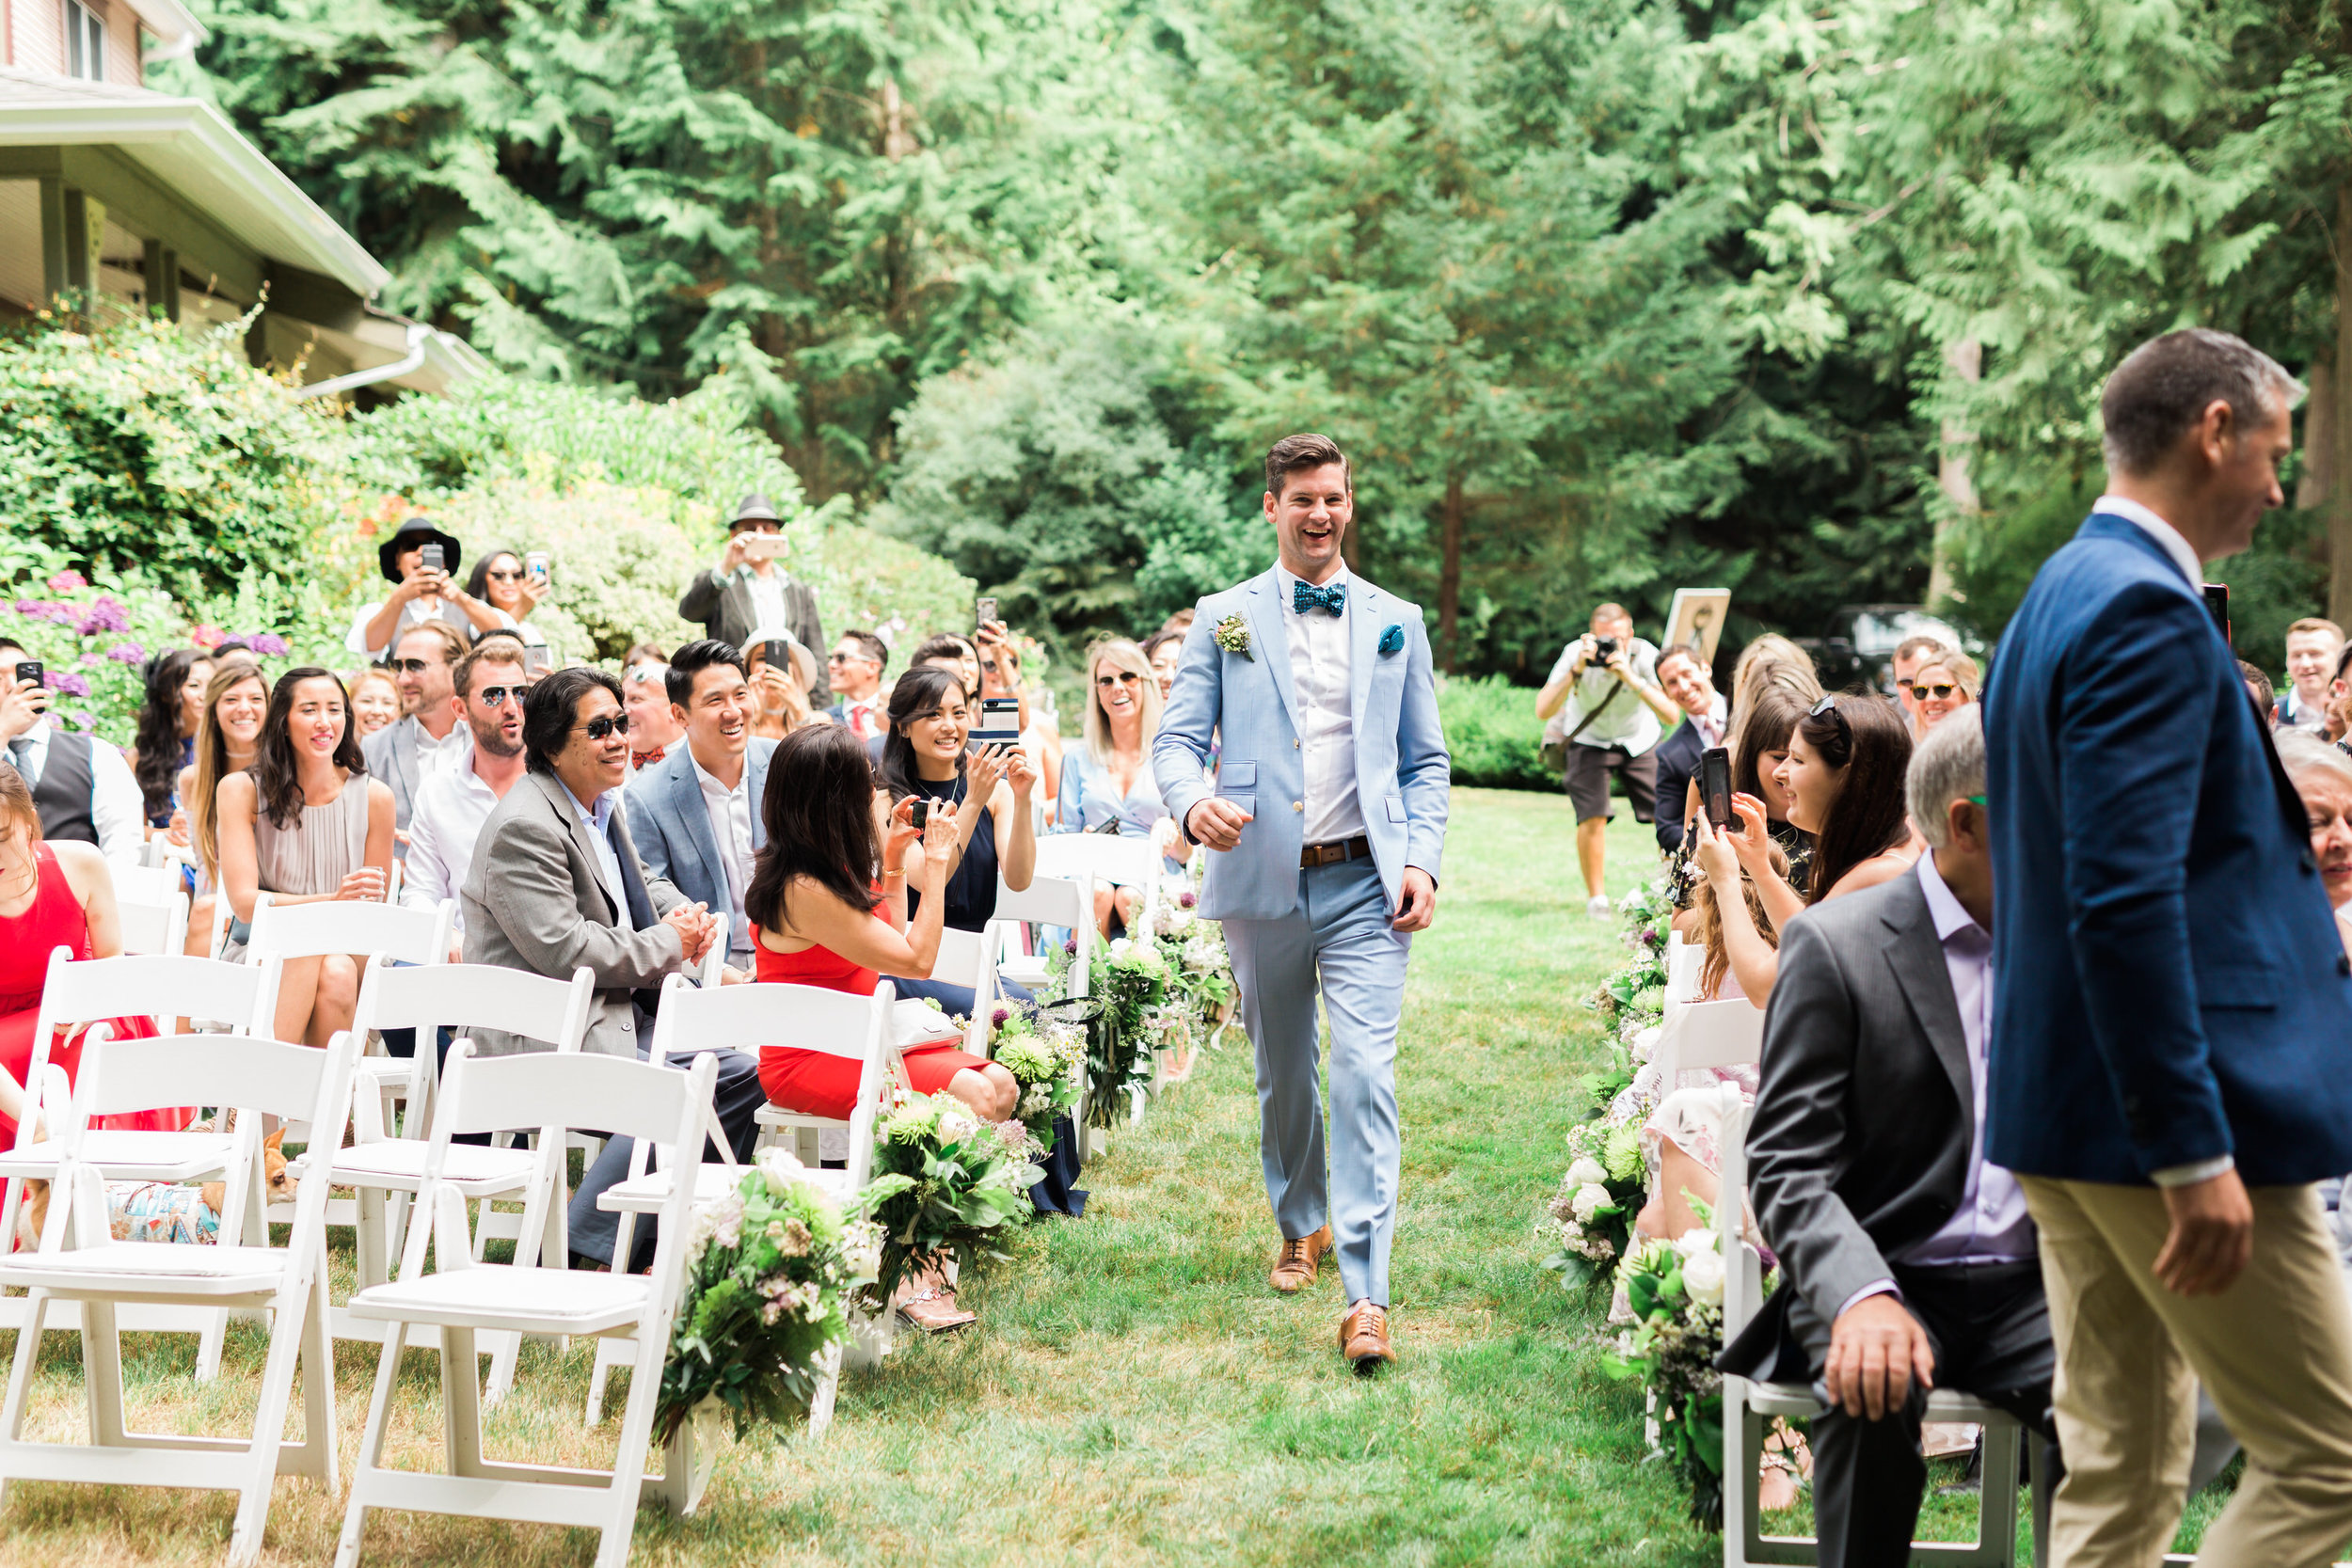 Linwood House Wedding Photos - Roberts Creek Wedding Photos - Vancouver Wedding Photographer & Videographer - Sunshine Coast Wedding Photos - Sunshine Coast Wedding Photographer - Jennifer Picard Photography - IMG_6183.jpg